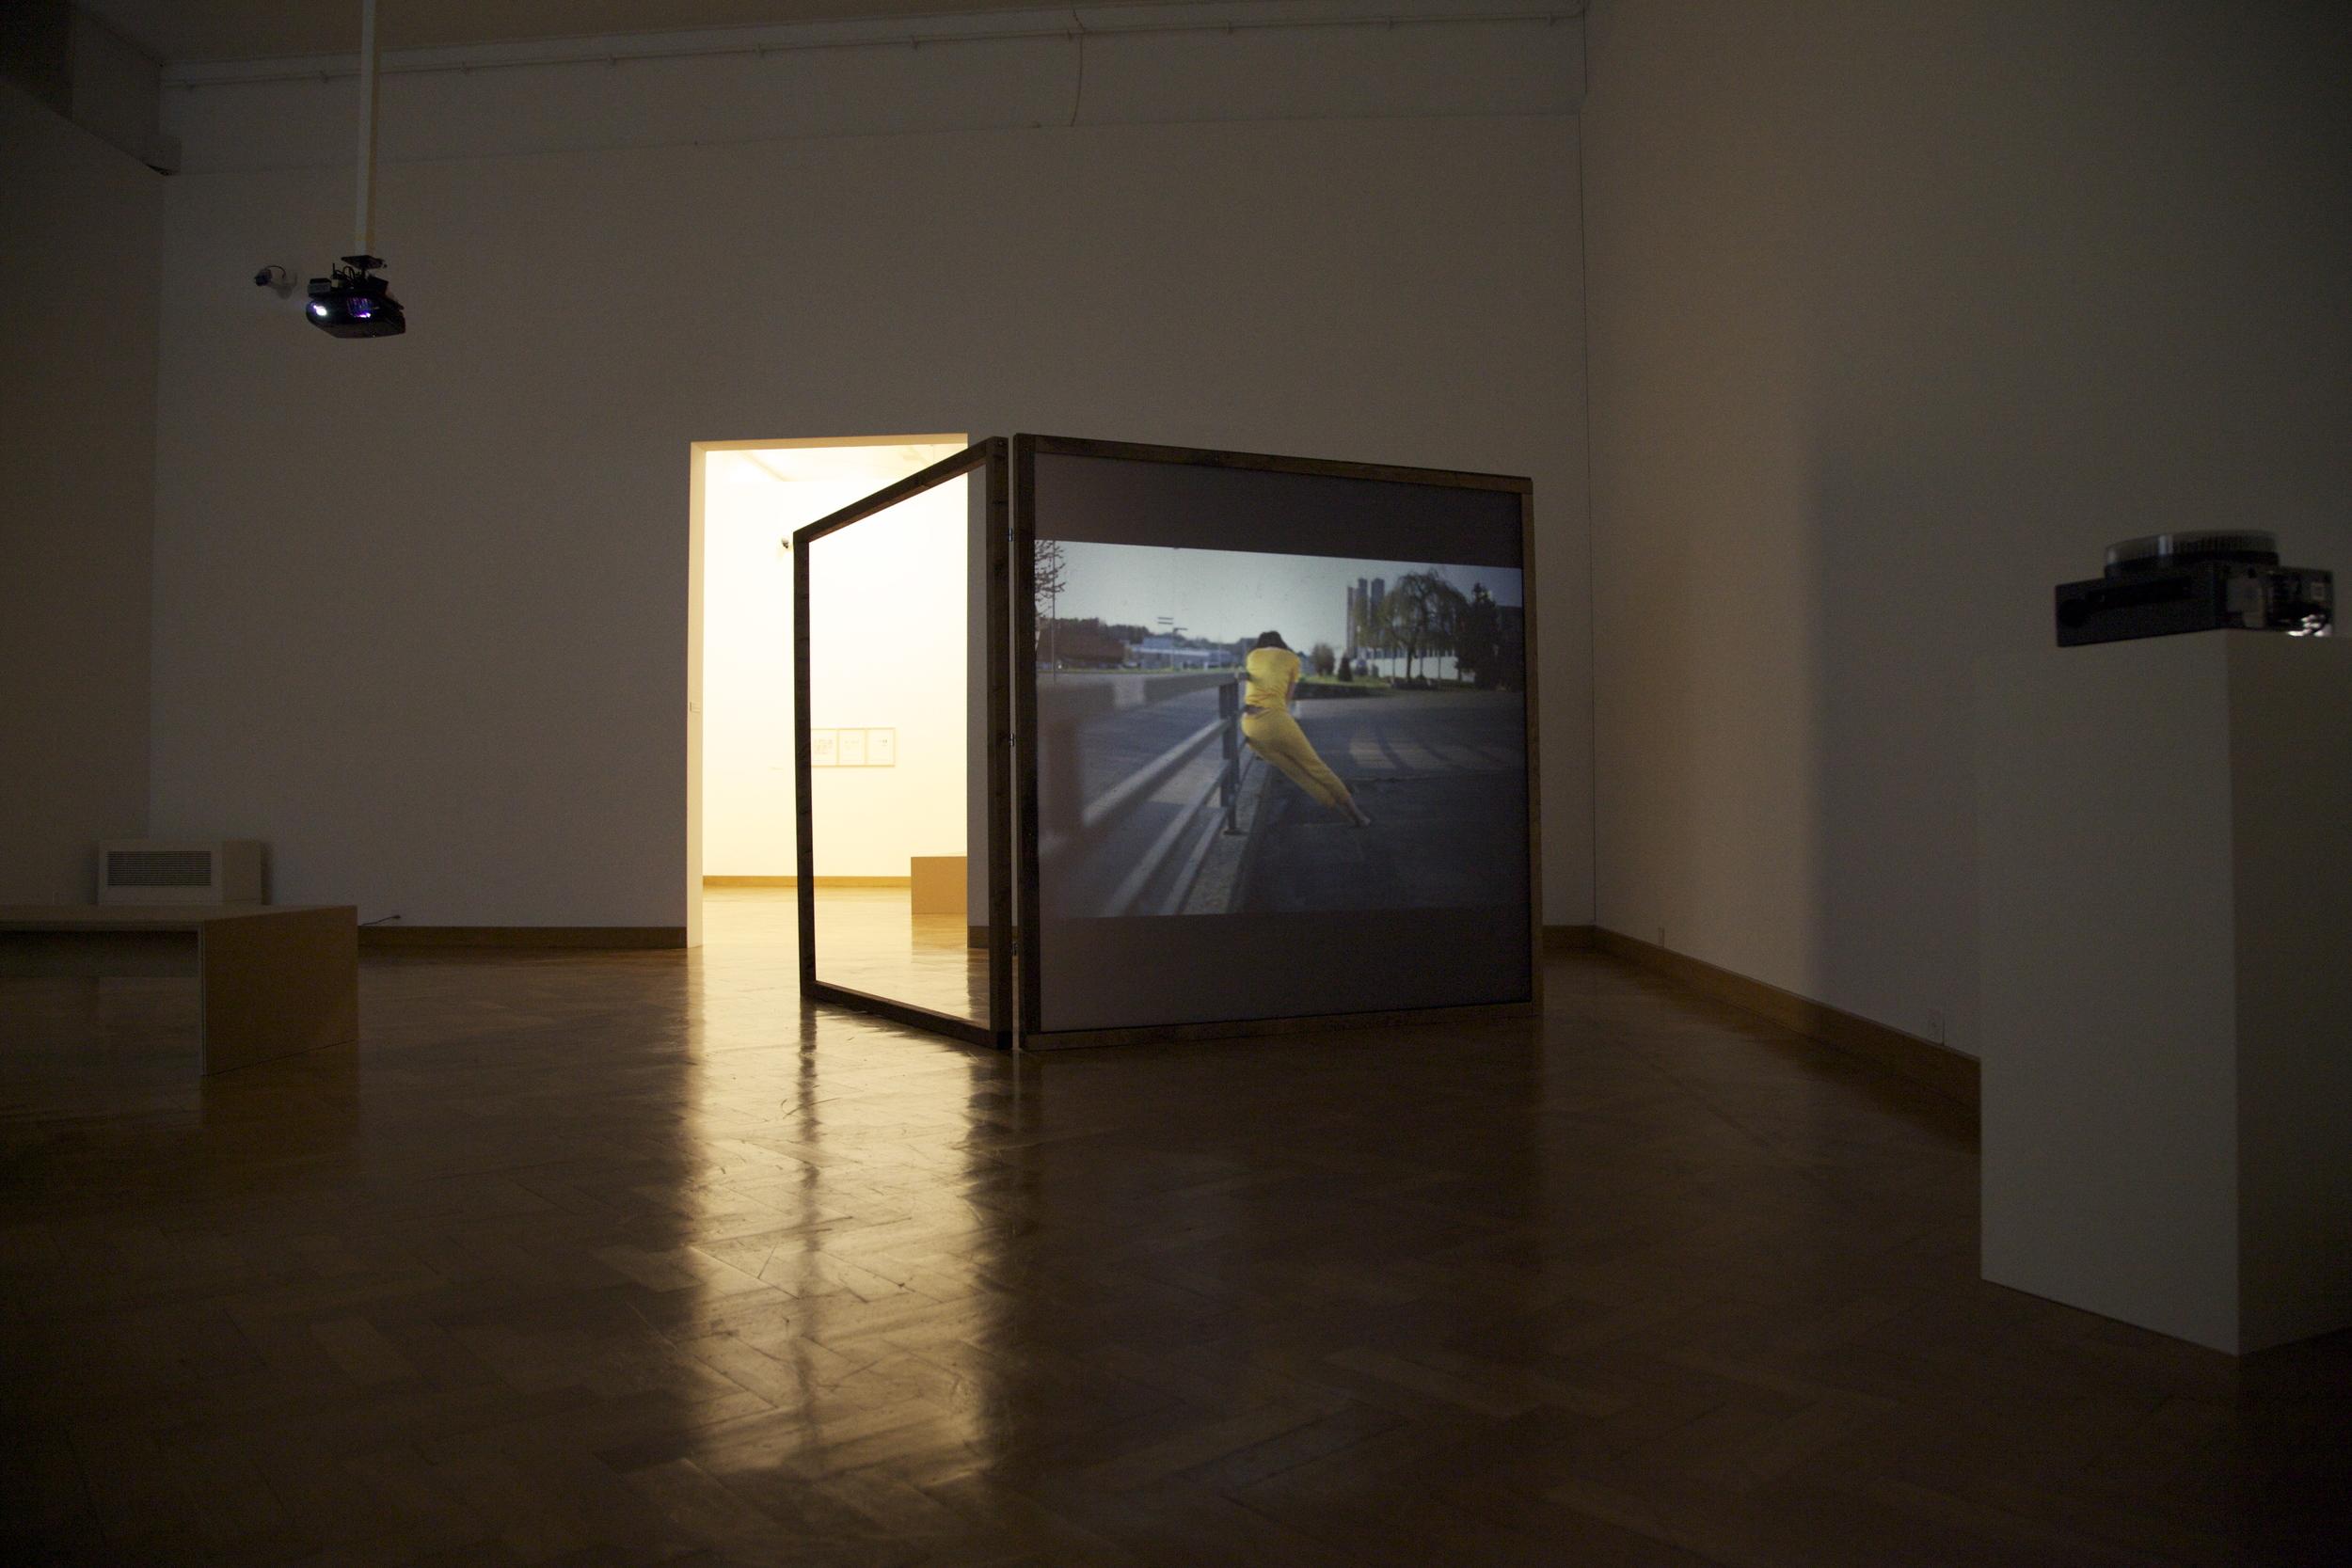 Anne Sylvie Henchoz, Conversation entre masses II, 2012, installation view, projection of slides on both sides screen, wooden structure of 186 x 186 cm.  Exhibition view Accrochage vaud 13, Musée des B  eaux-Arts, Lausanne, 2013.